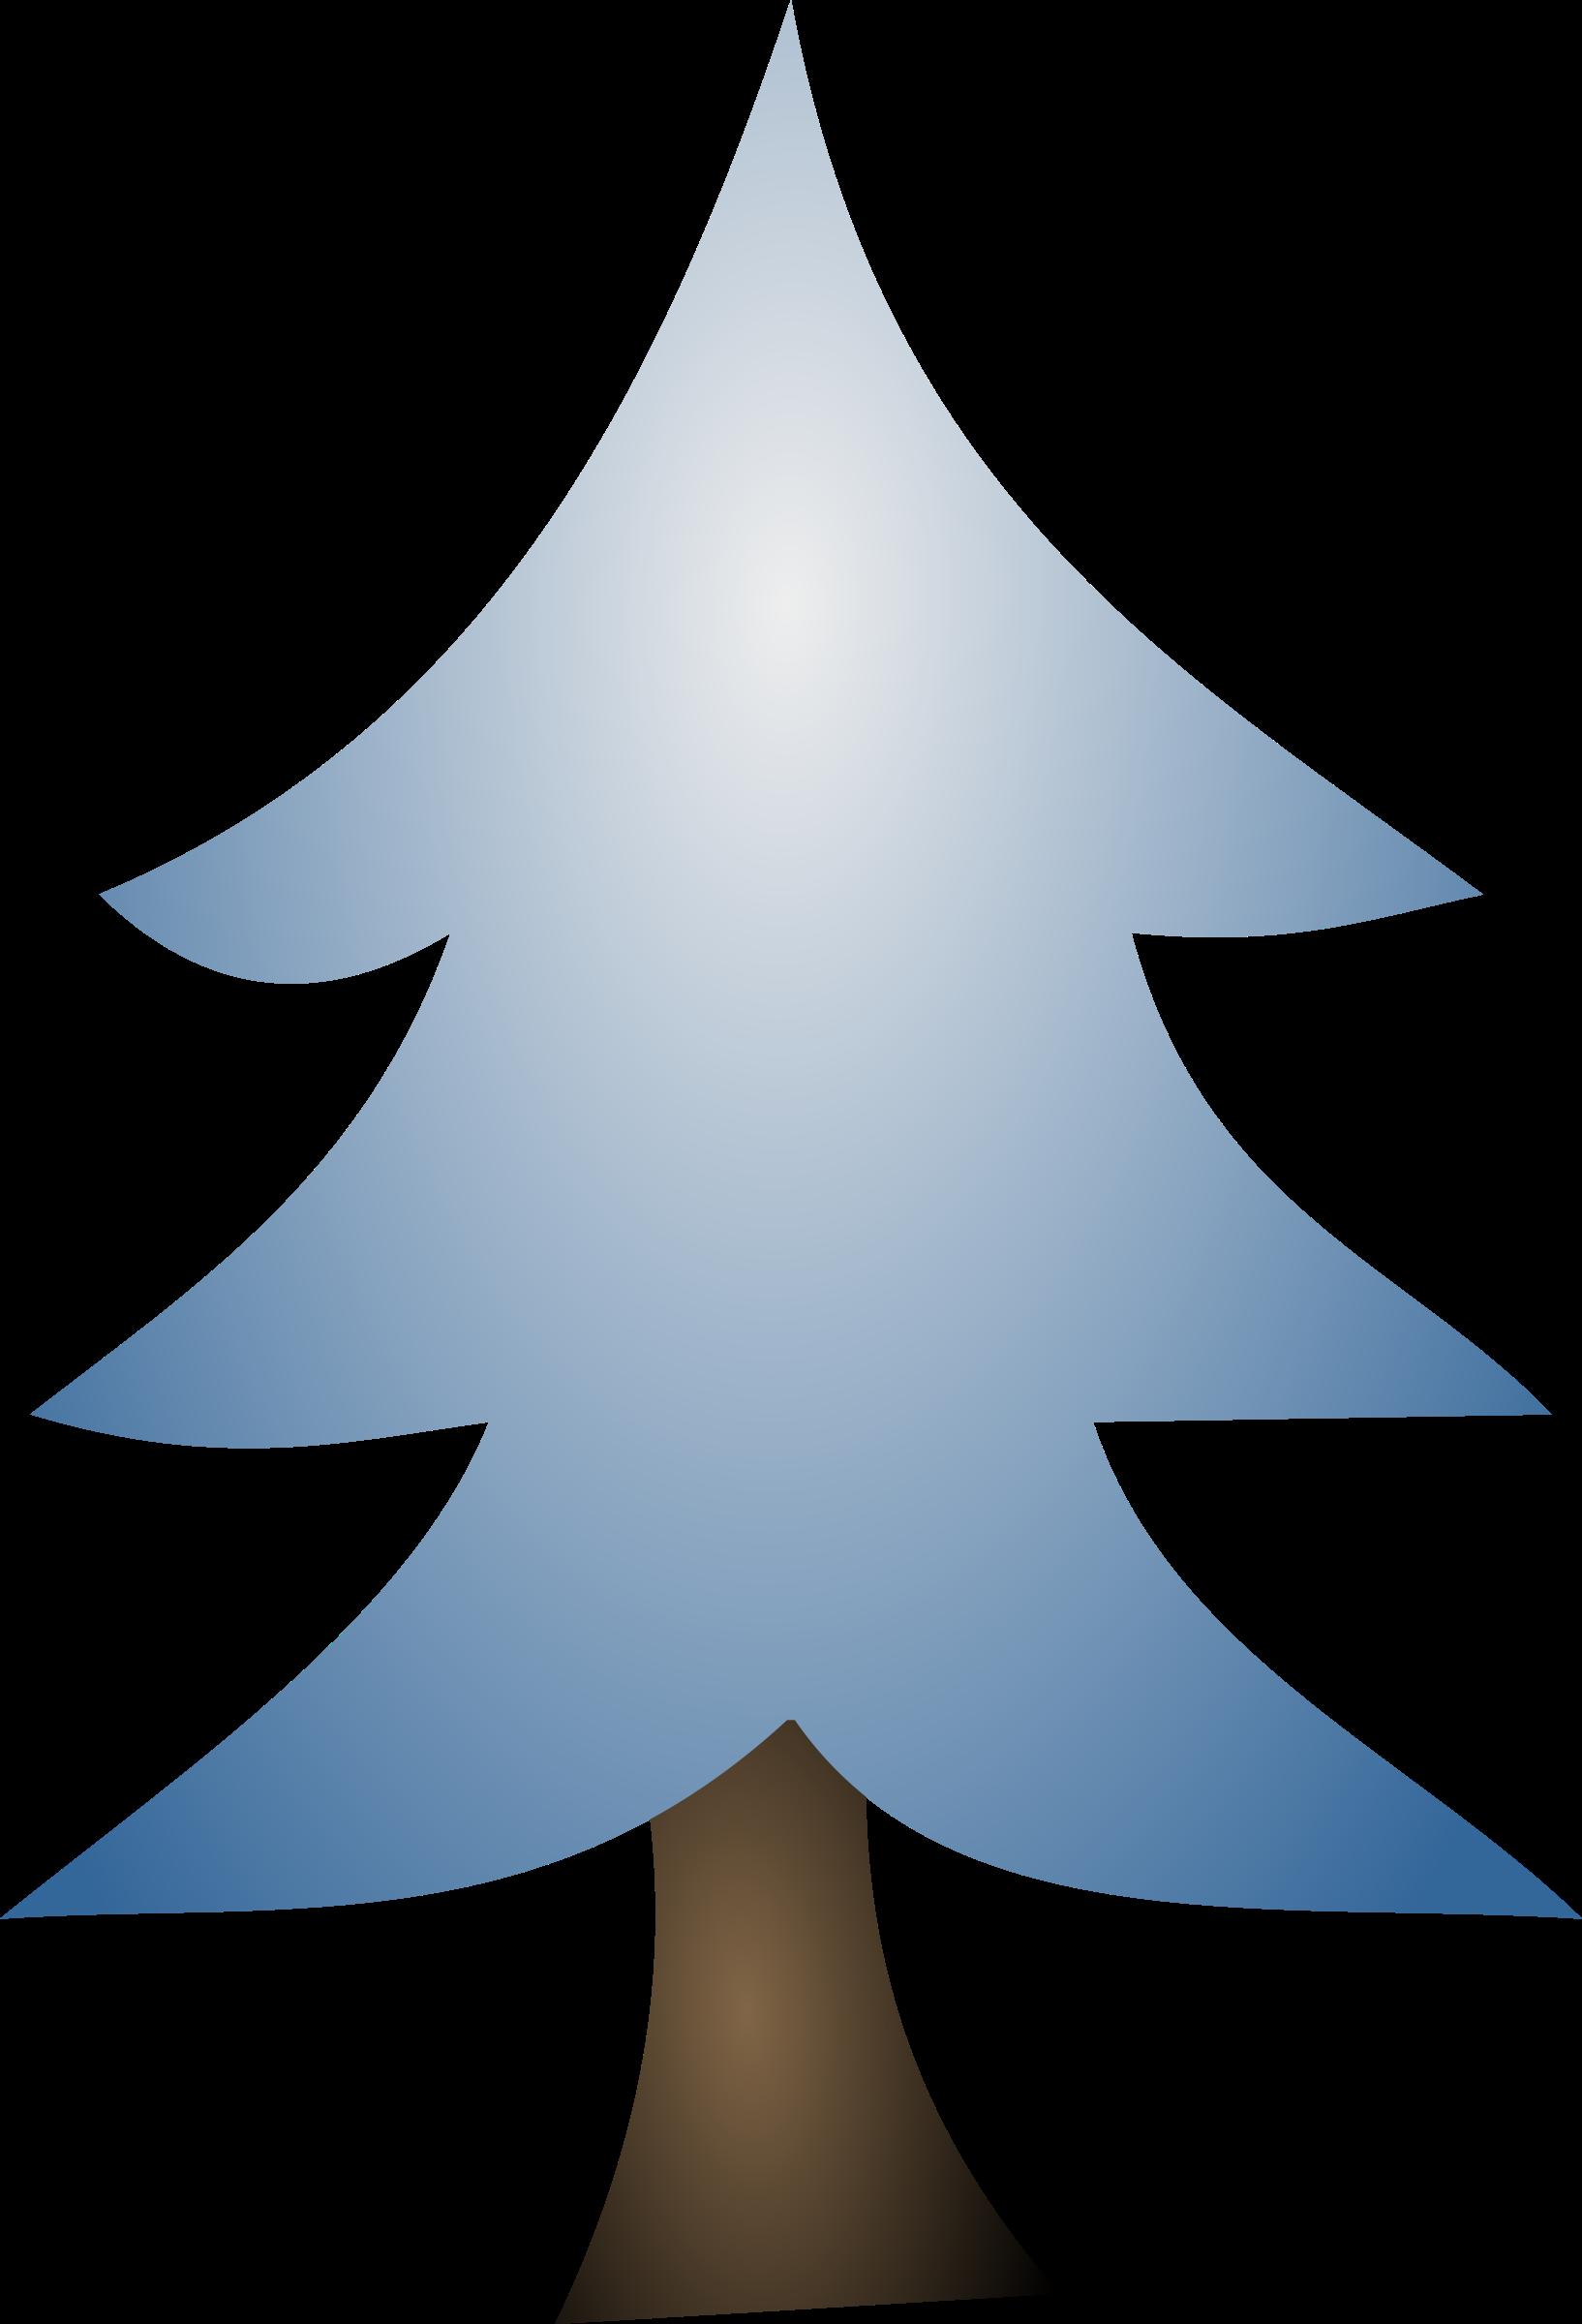 Winter tree clipart transparent jpg free Clipart - Winter Tree 3 jpg free